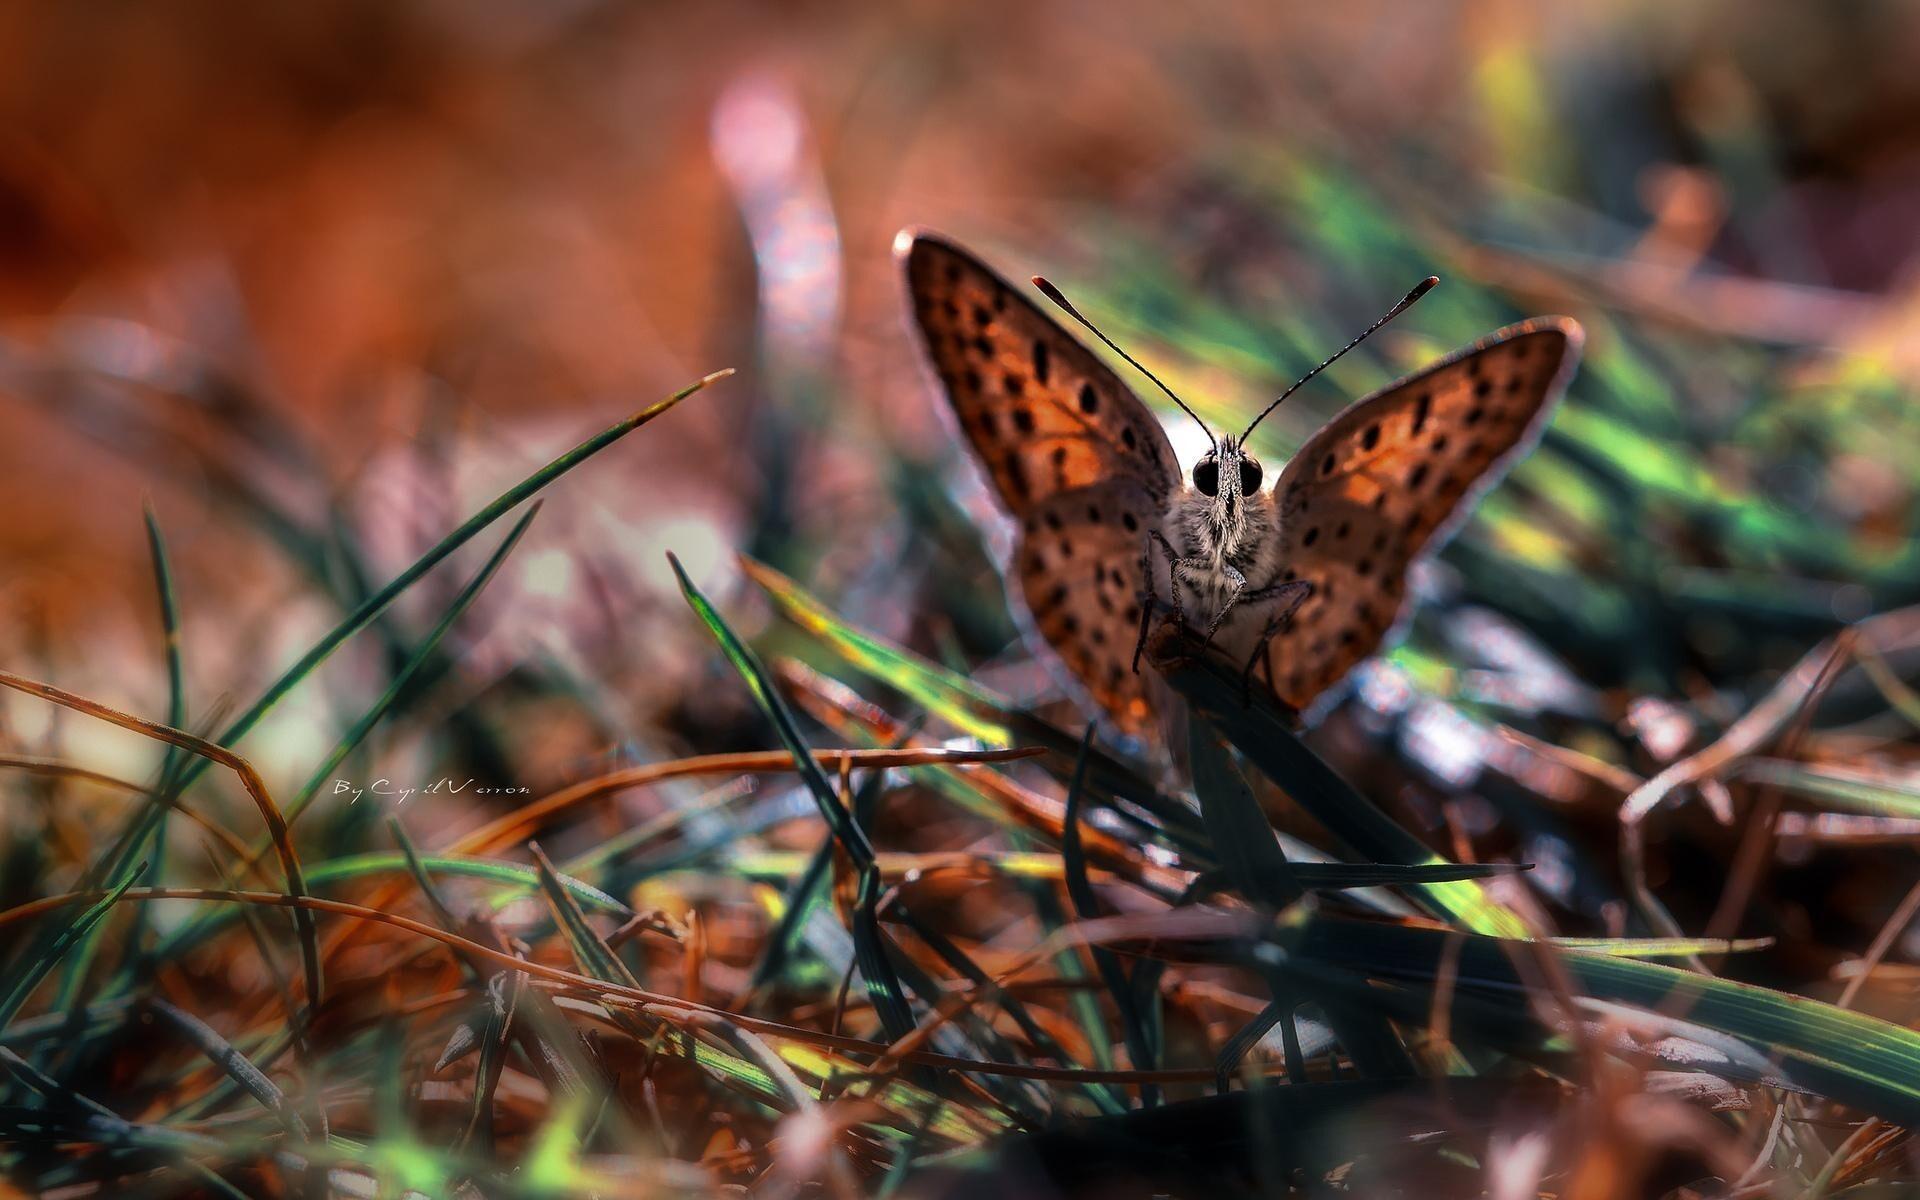 Cute Butterfly on Grass Wallpaper | HD Wallpapers